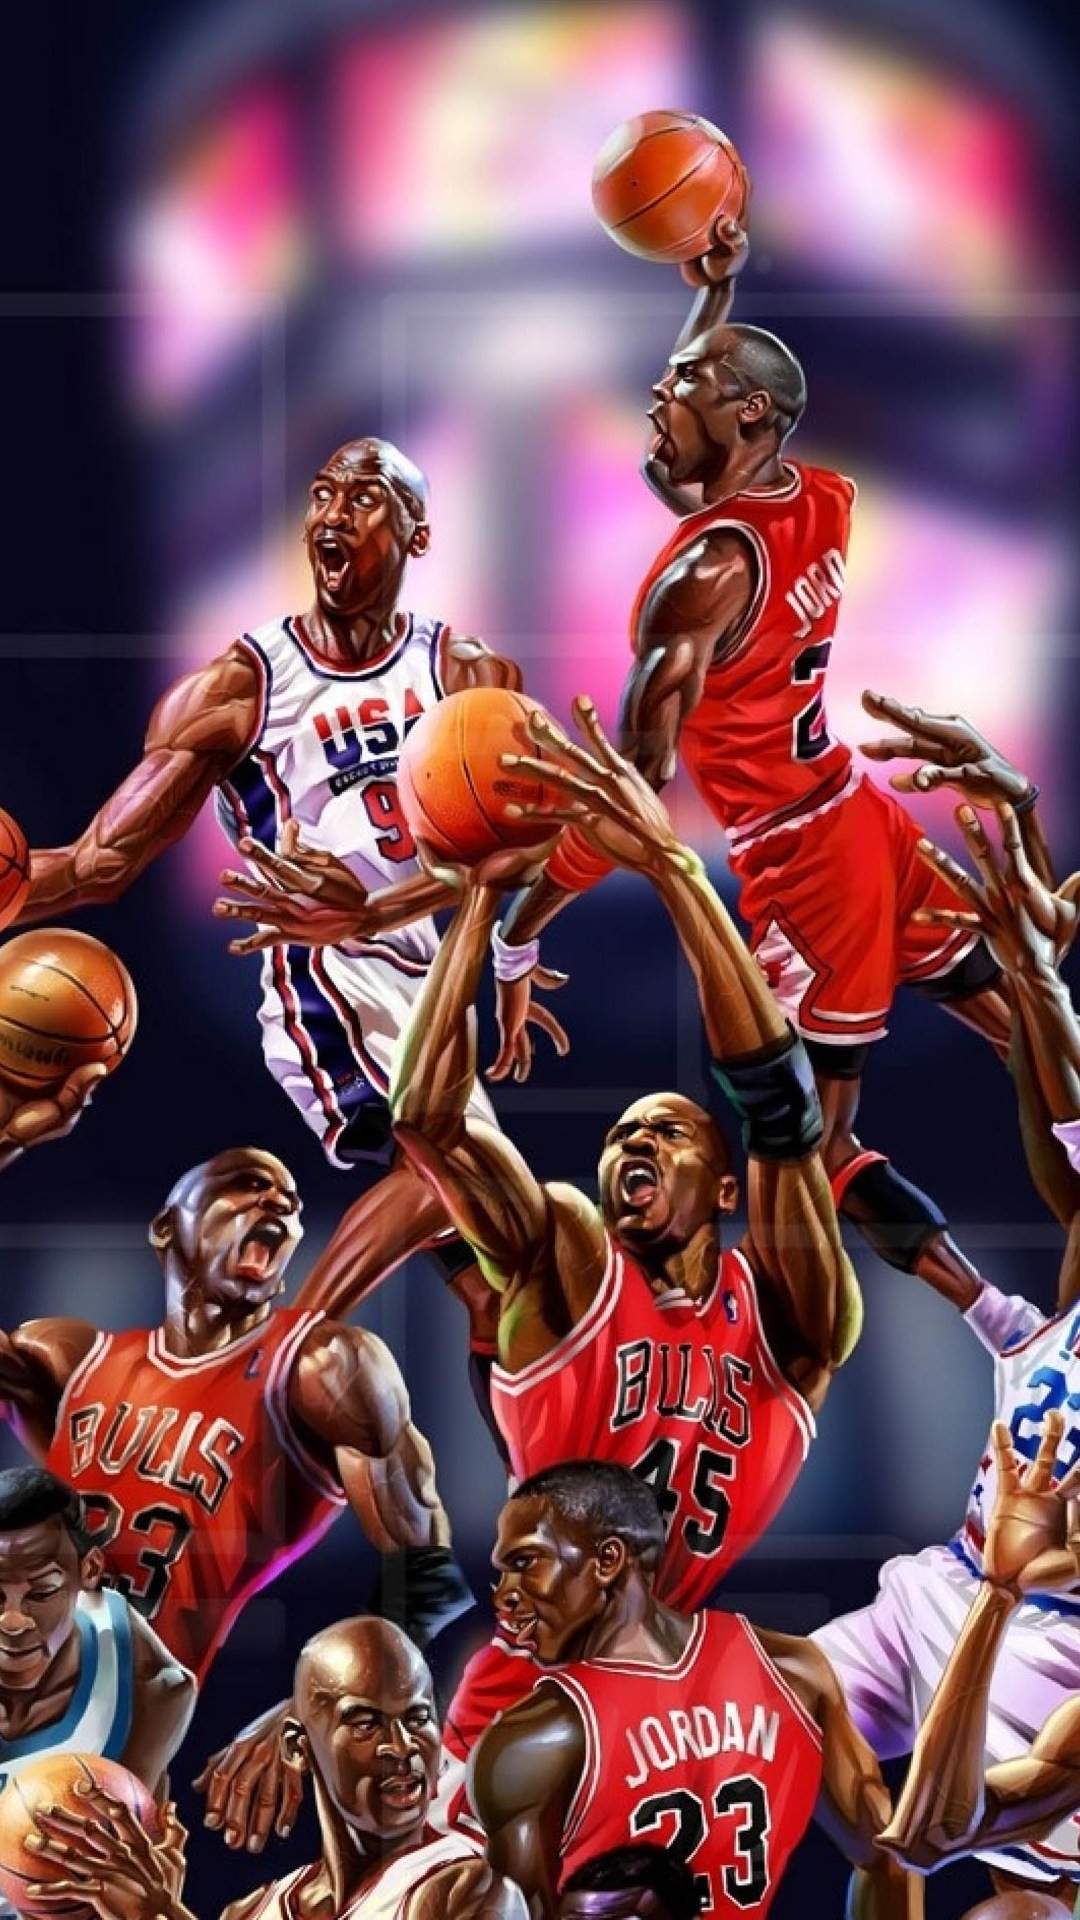 Michael Jordan Wallpaper Iphone Xr